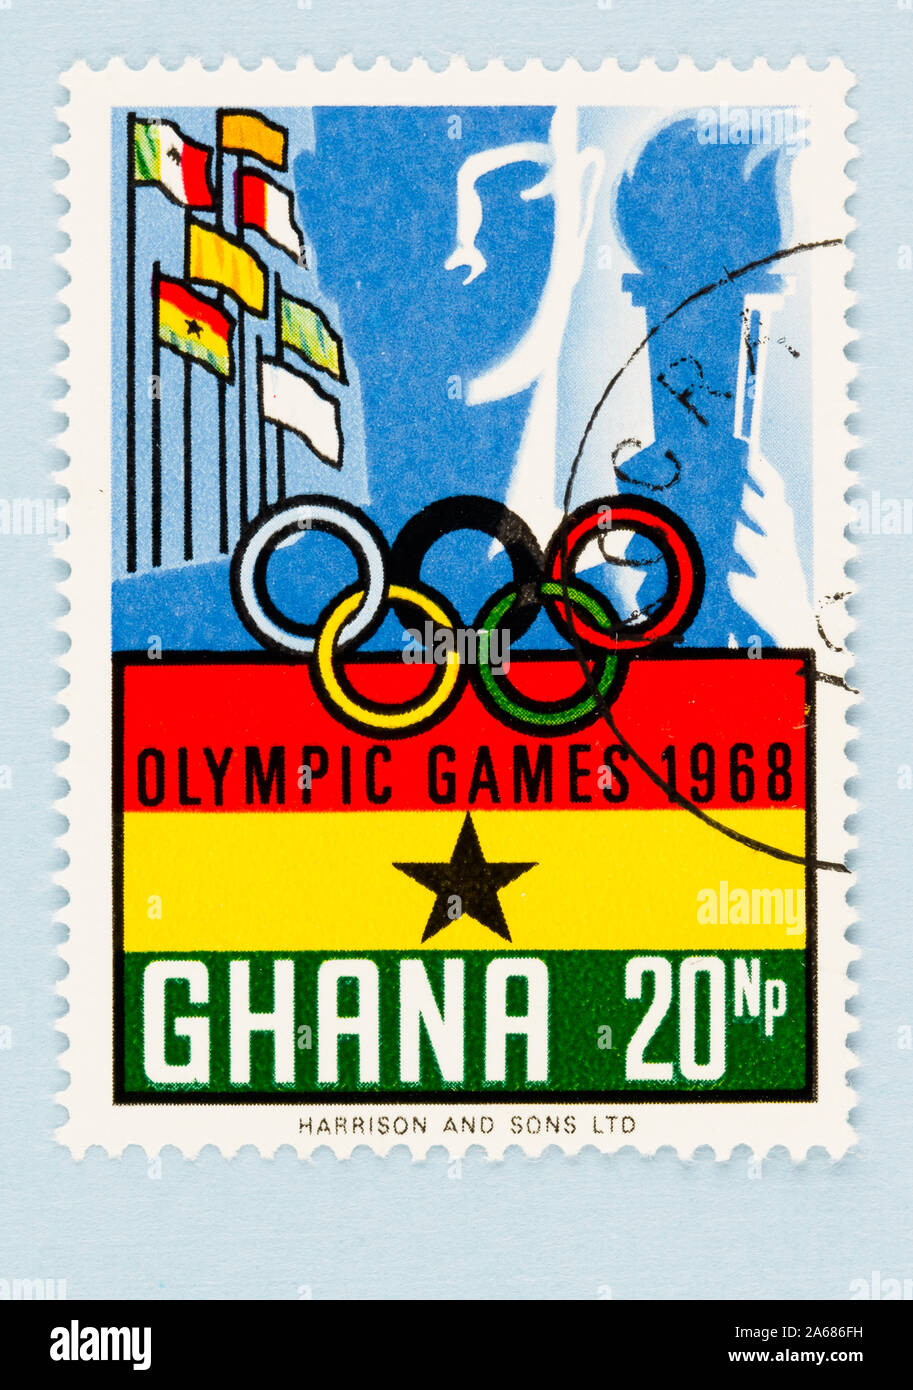 Ghana hook up pagina